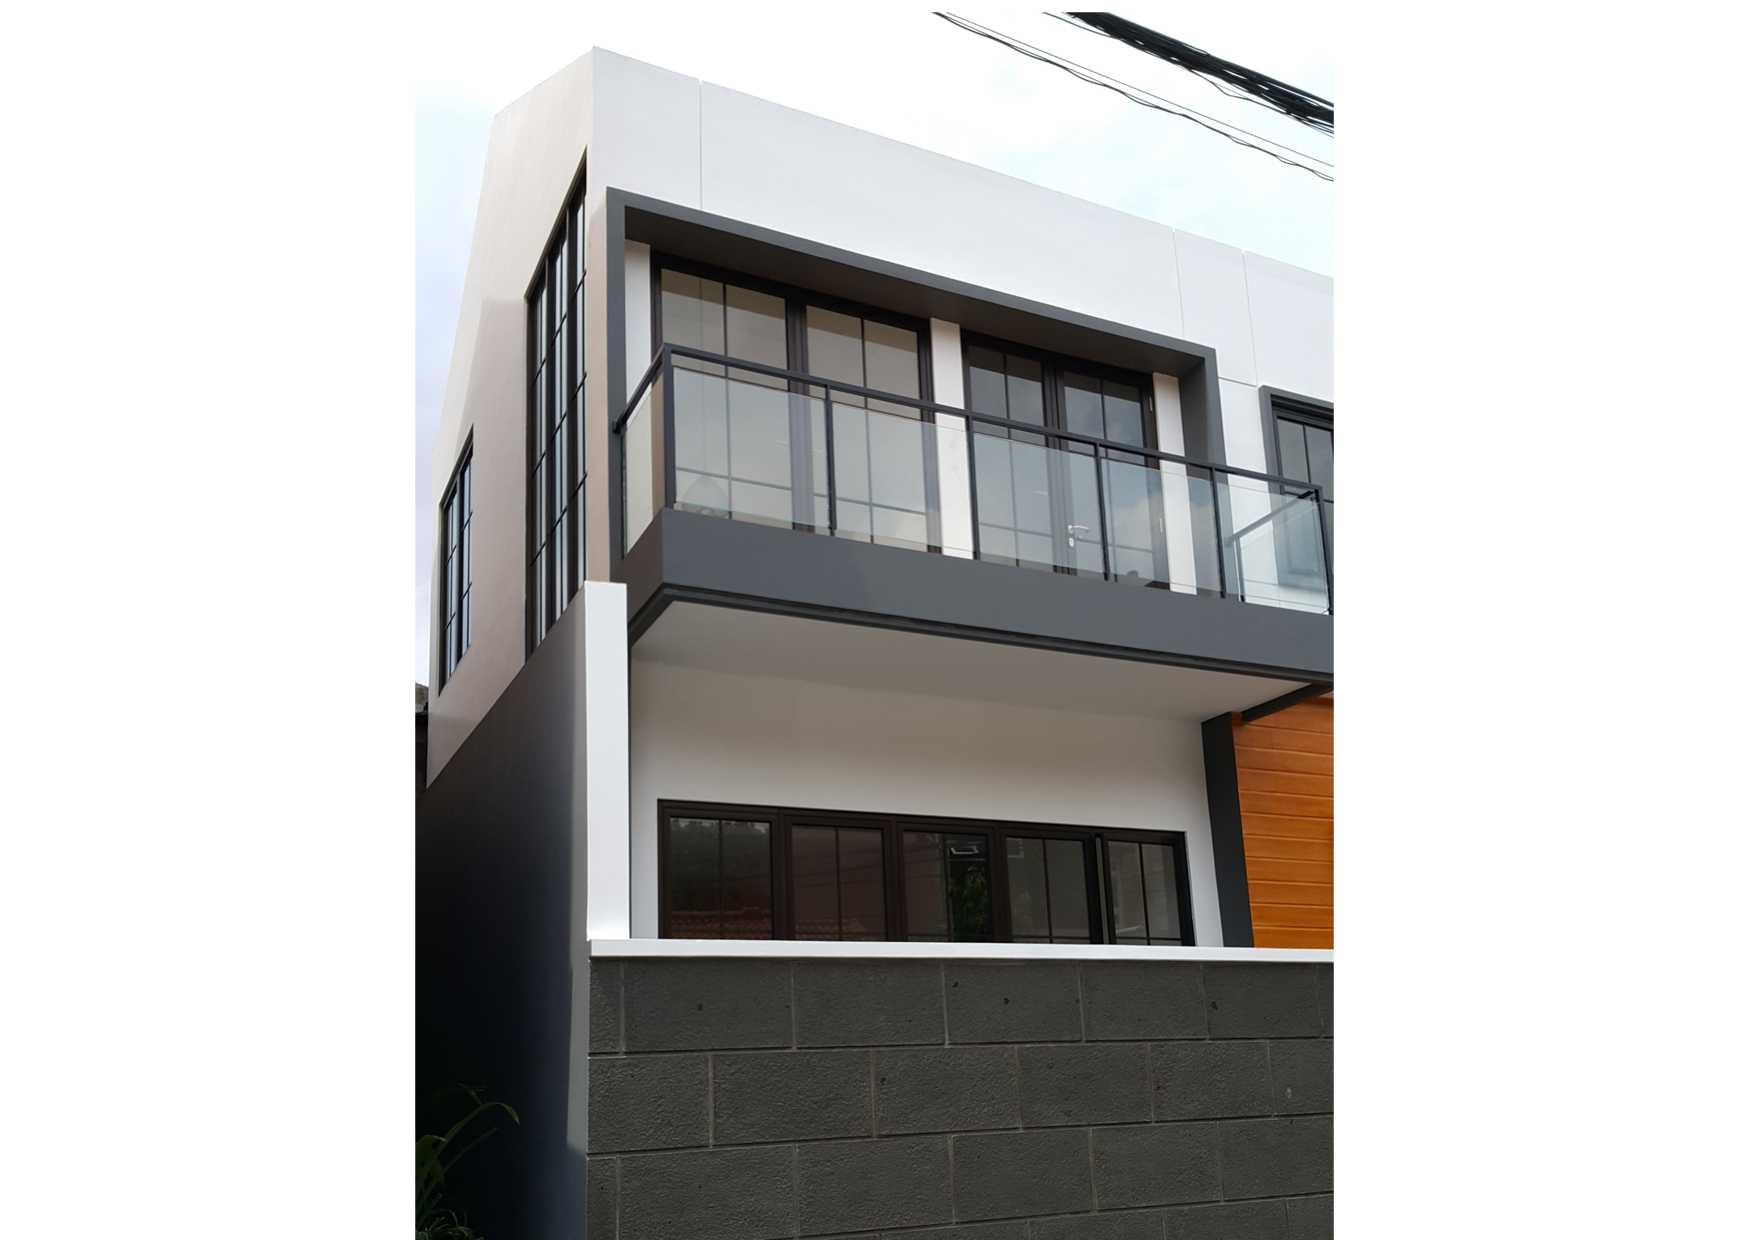 Bral Architect Satria Residence Pasar Minggu, South Jakarta City, Jakarta, Indonesia Pasar Minggu, Jakarta Satria-Depan-3 Modern  24918